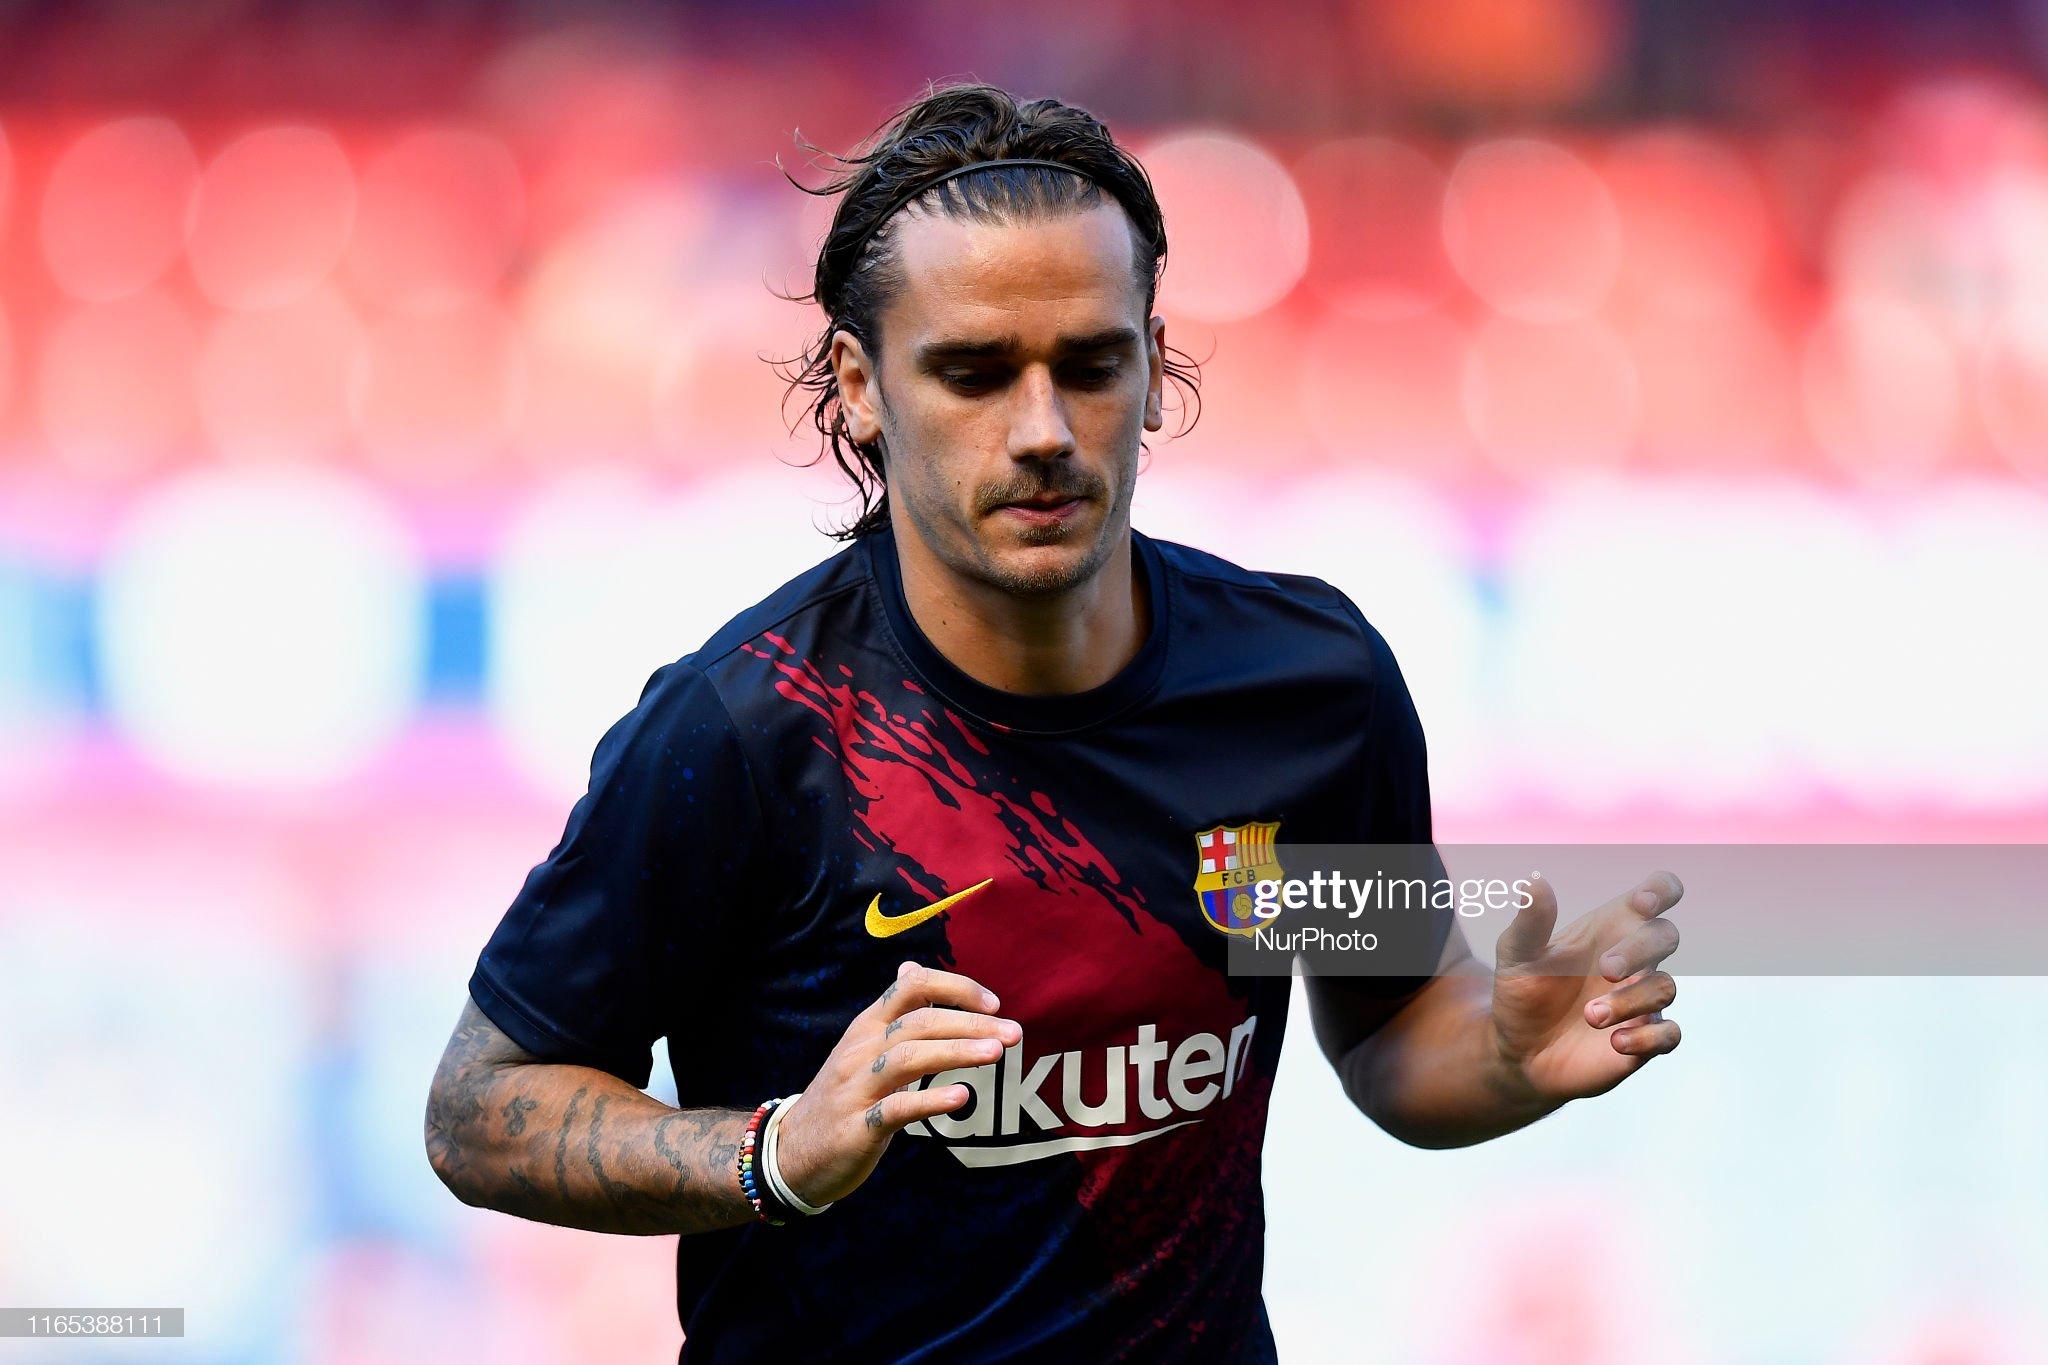 صور مباراة : أوساسونا - برشلونة 2-2 ( 31-08-2019 )  Antoine-griezmann-of-barcelona-during-the-warmup-before-the-liga-ca-picture-id1165388111?s=2048x2048